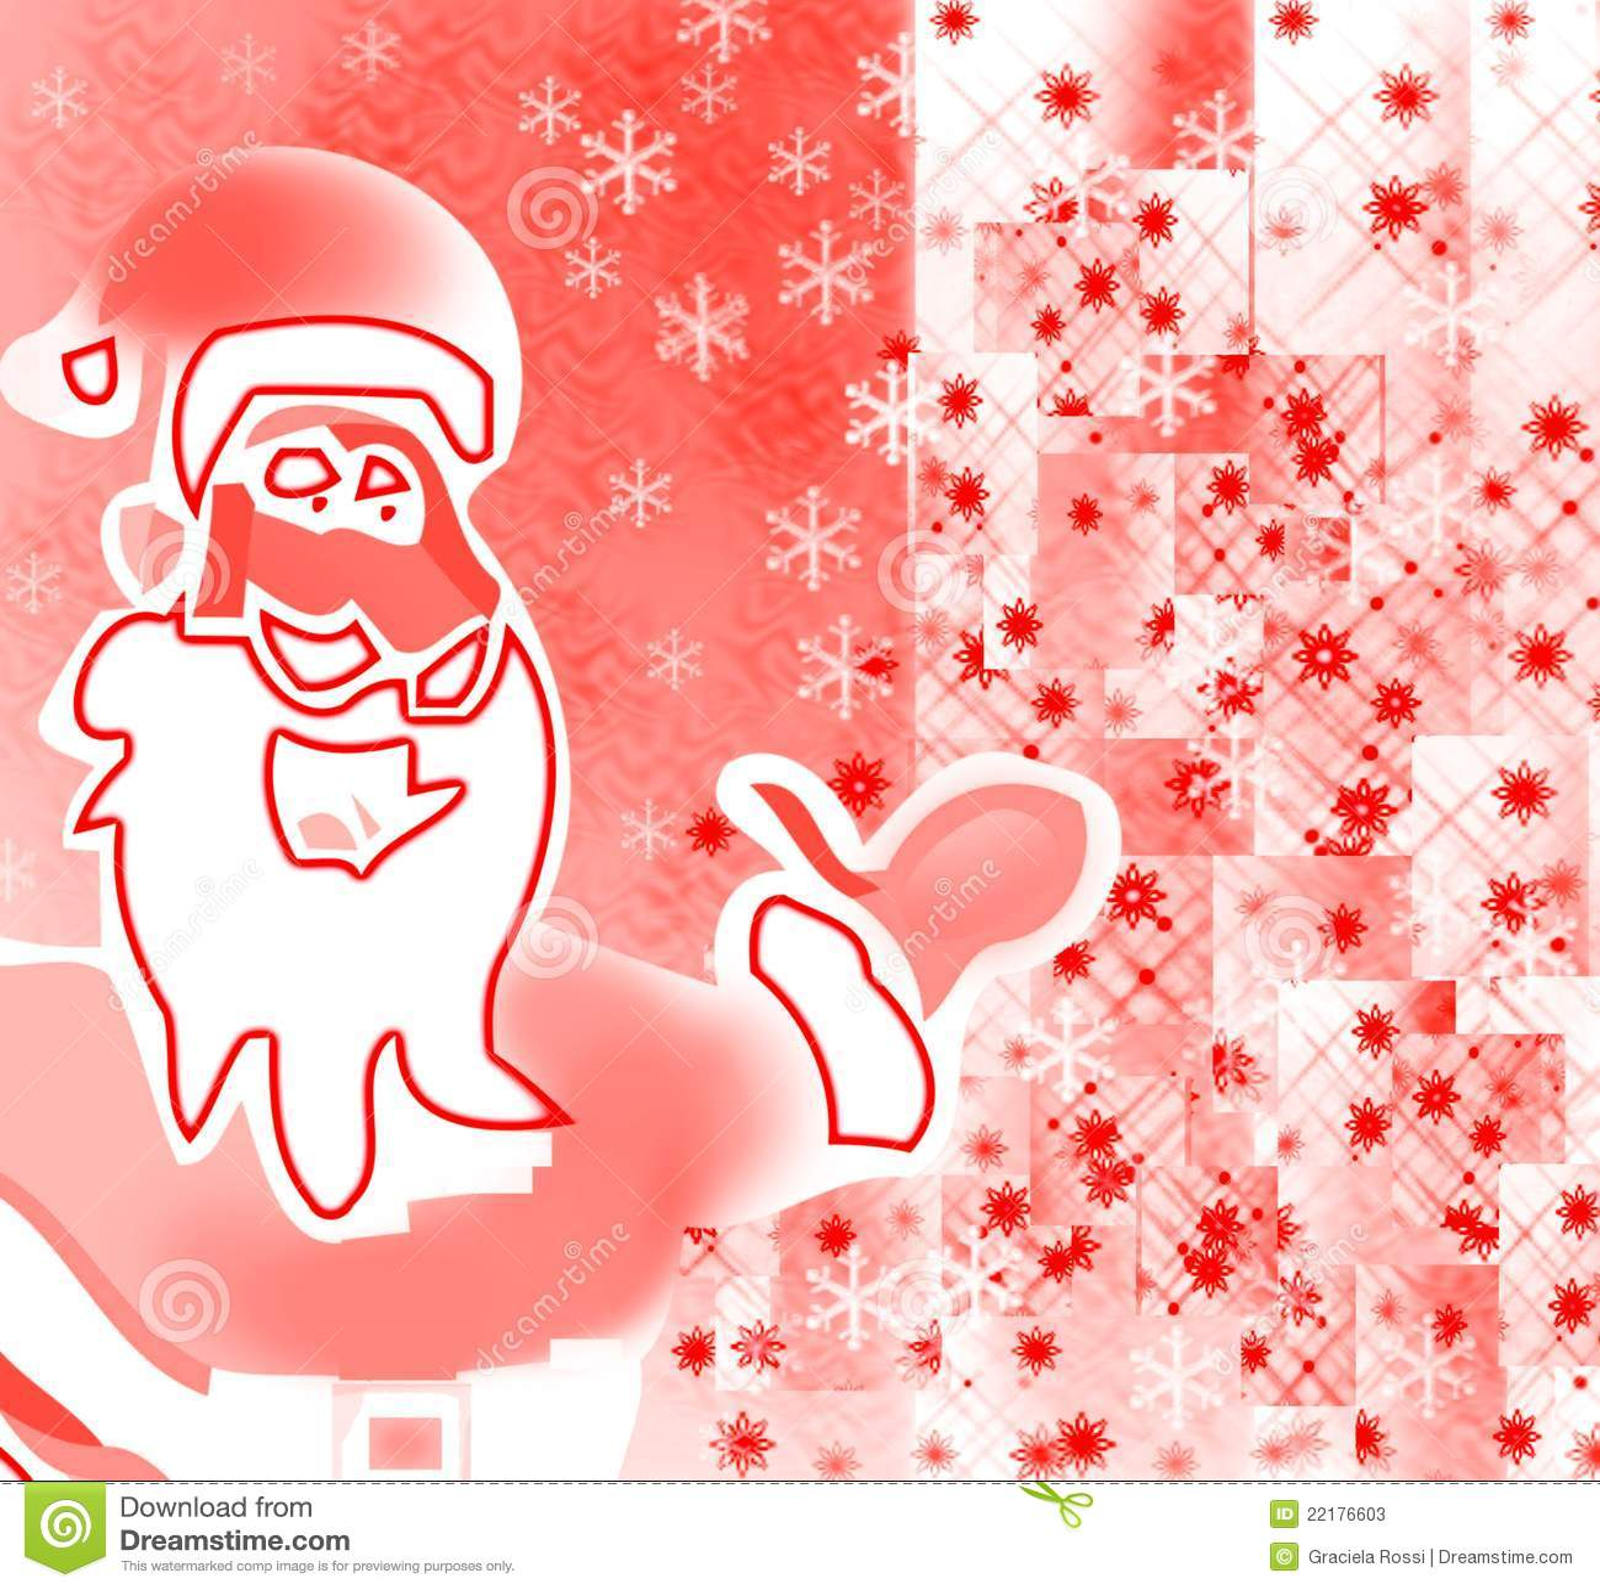 Santa που εμφανίζει τους εορτασμούς και δώρα εύθυμου